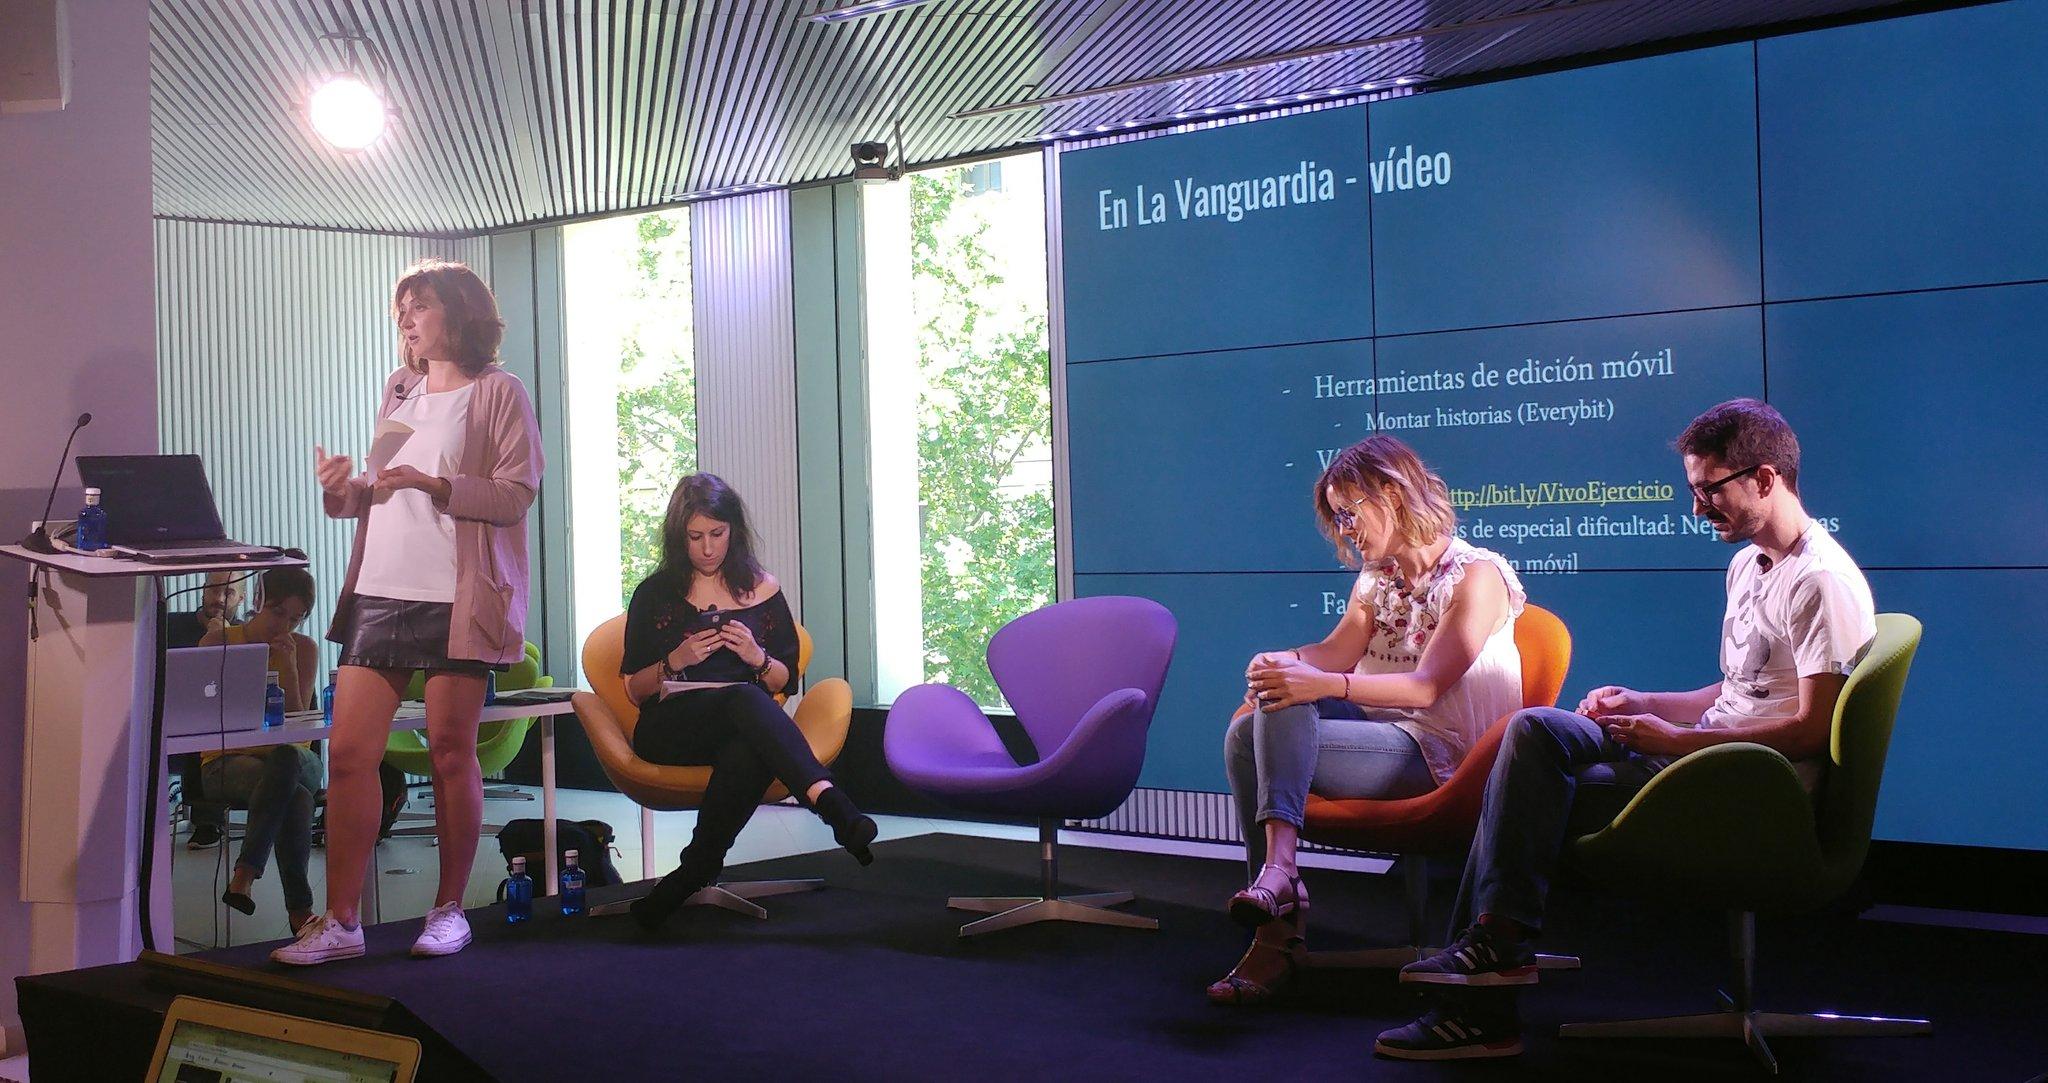 Thumbnail for Mesa redonda 2. Periodismo móvil y redes sociales: